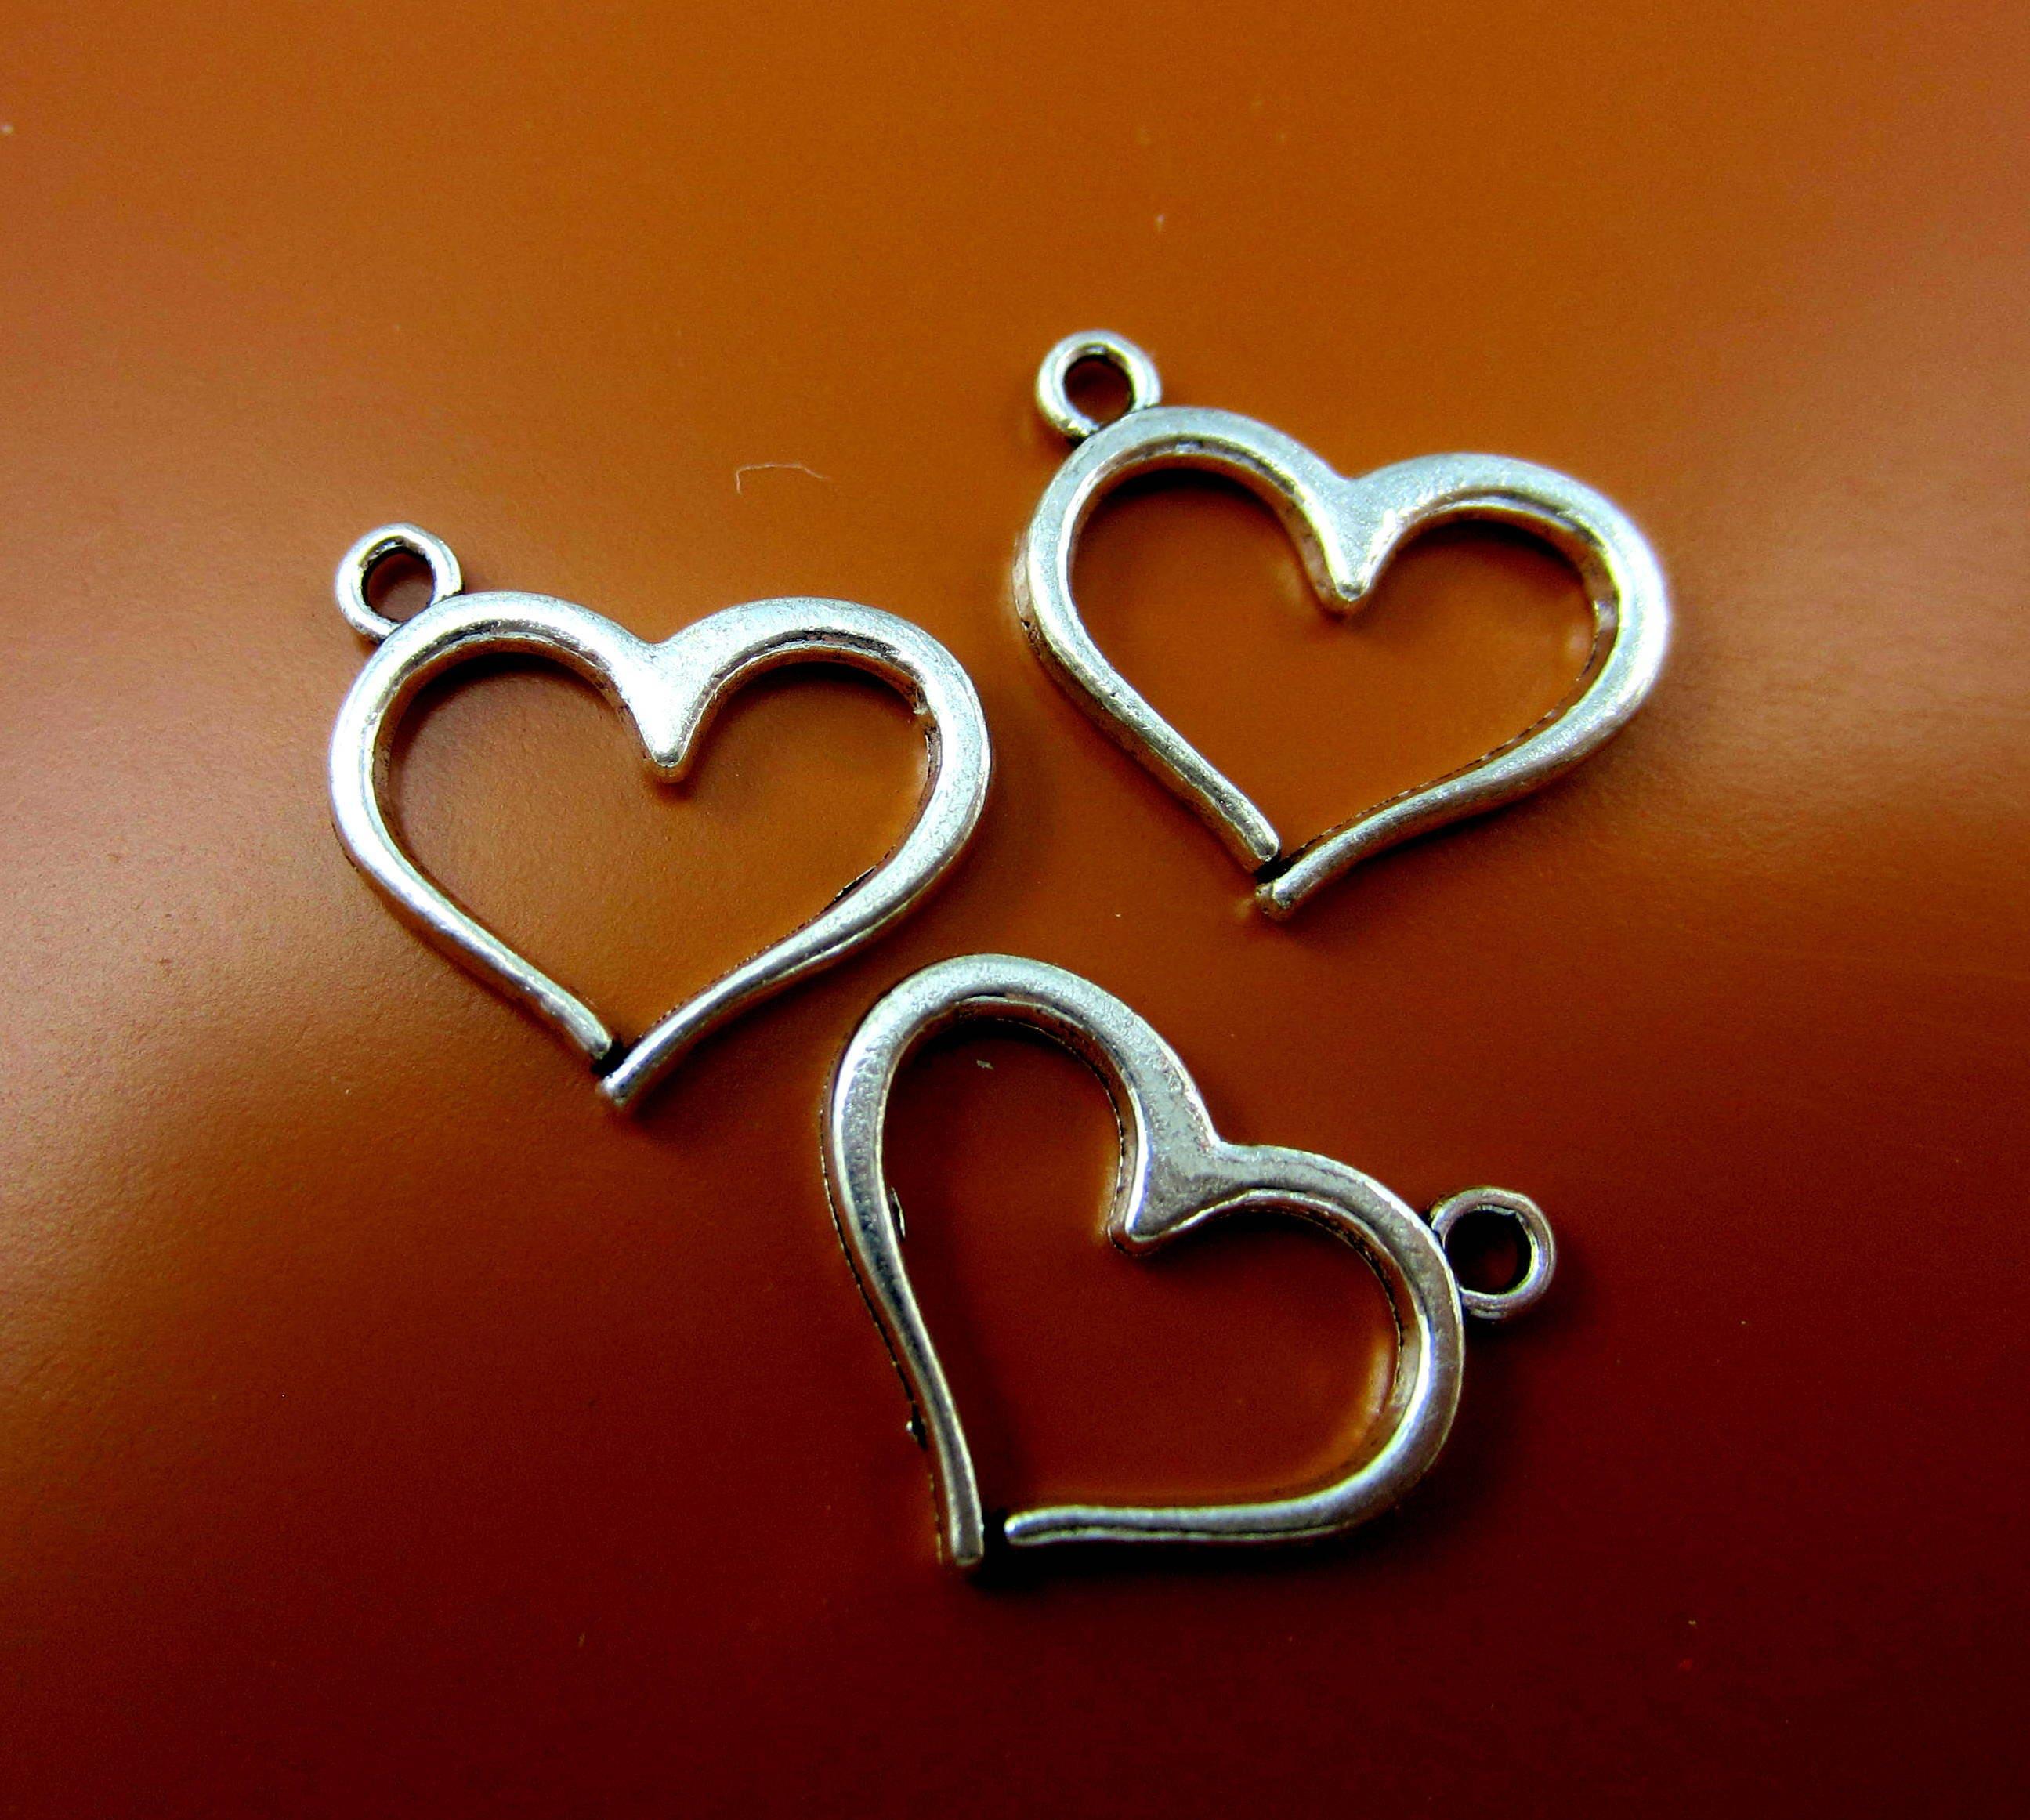 12 Heart charms antique silver metal heart pendants 16mm x